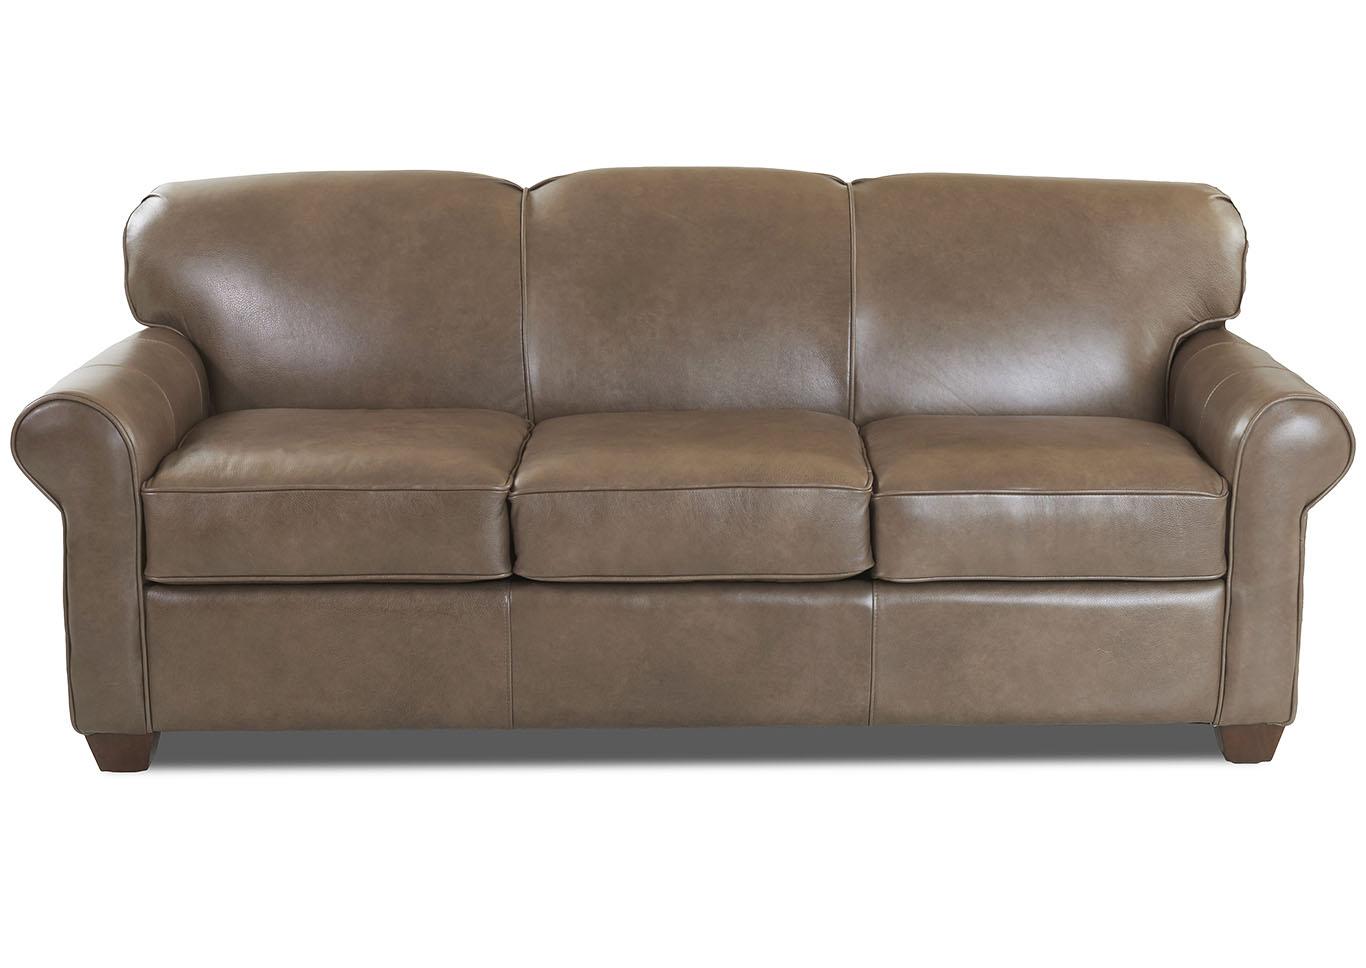 - Mayhew Brown Leather Sleeper Sofa Weiss Furniture